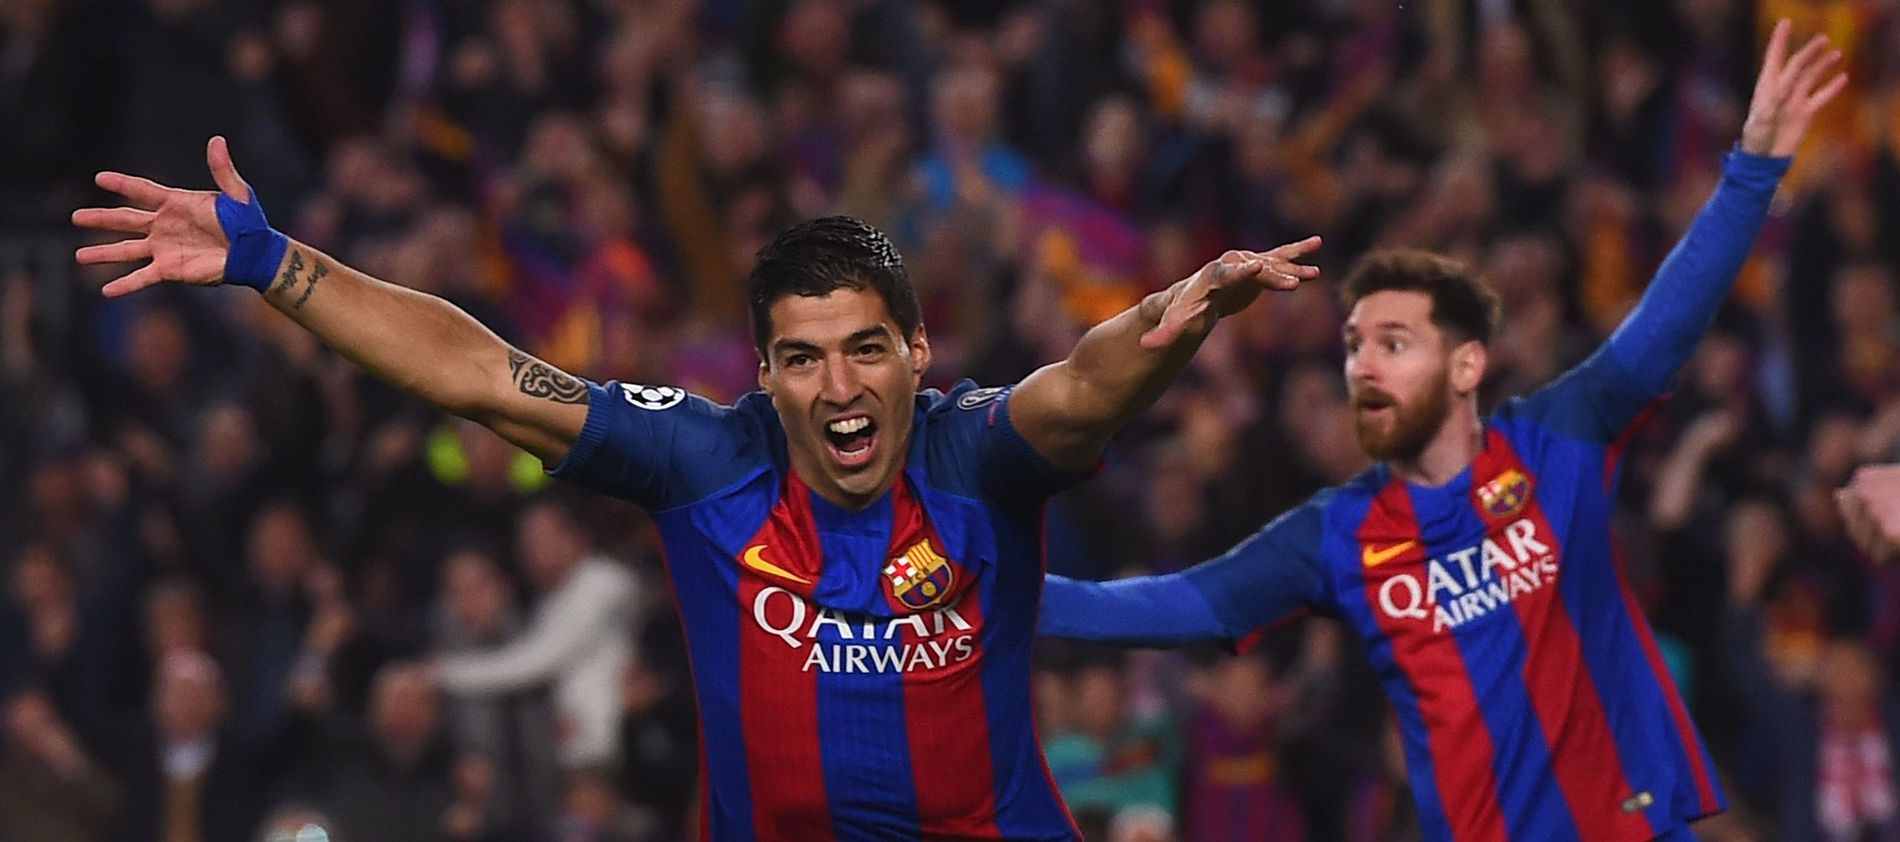 JUBEL: Luis Suárez og Lionel Messi feirer onsdagens vanvittige triumf over Paris Saint-Germain.